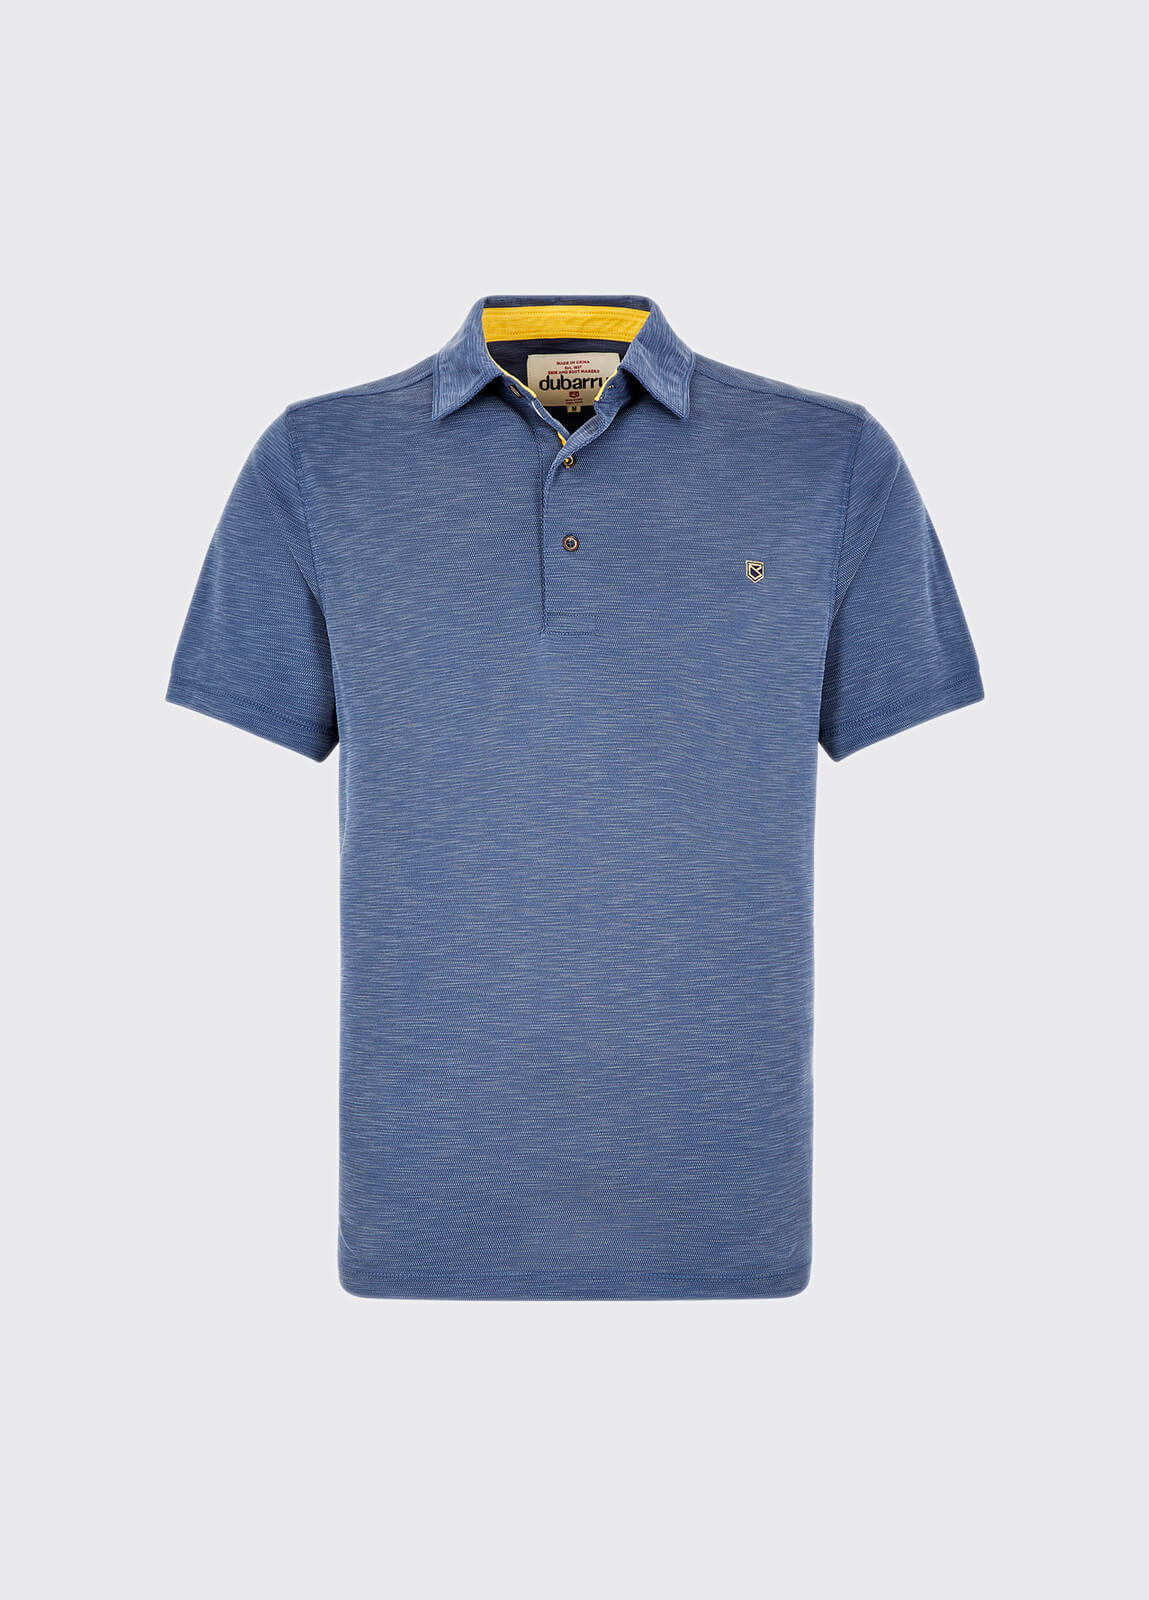 Elphin Polo Shirt - Navy